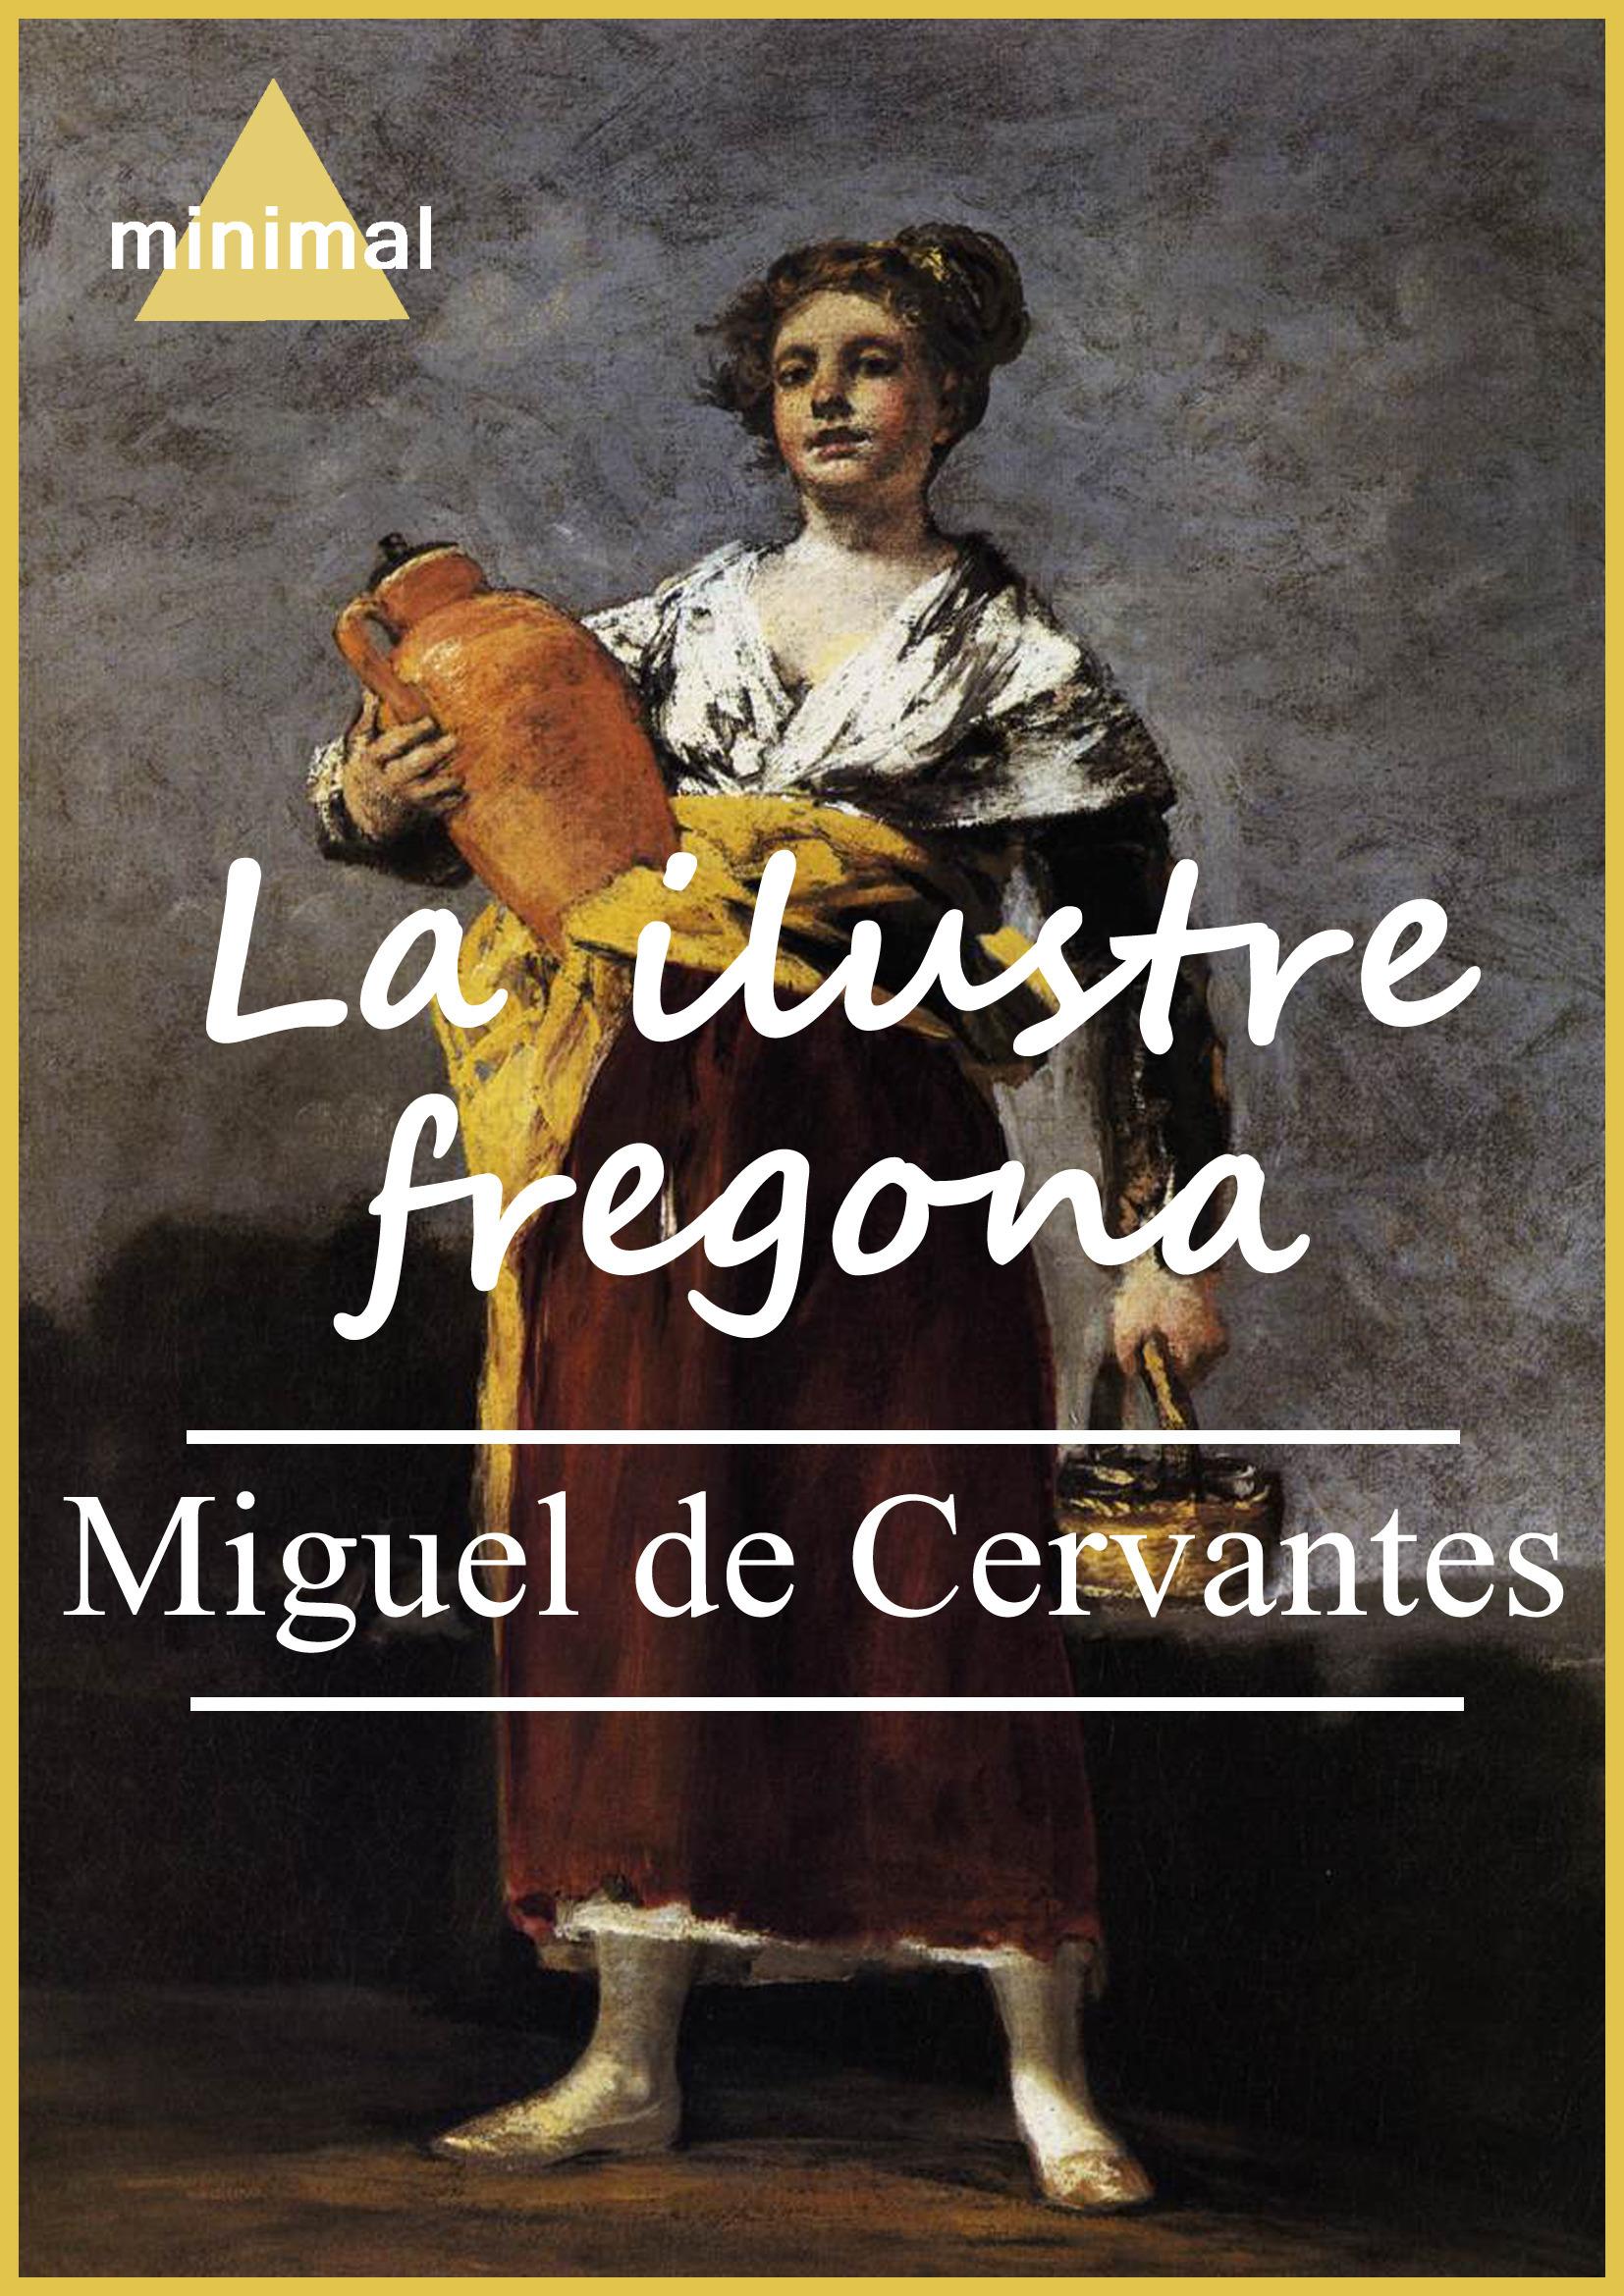 Miguel De Cervantes Saavedra La ilustre fregona